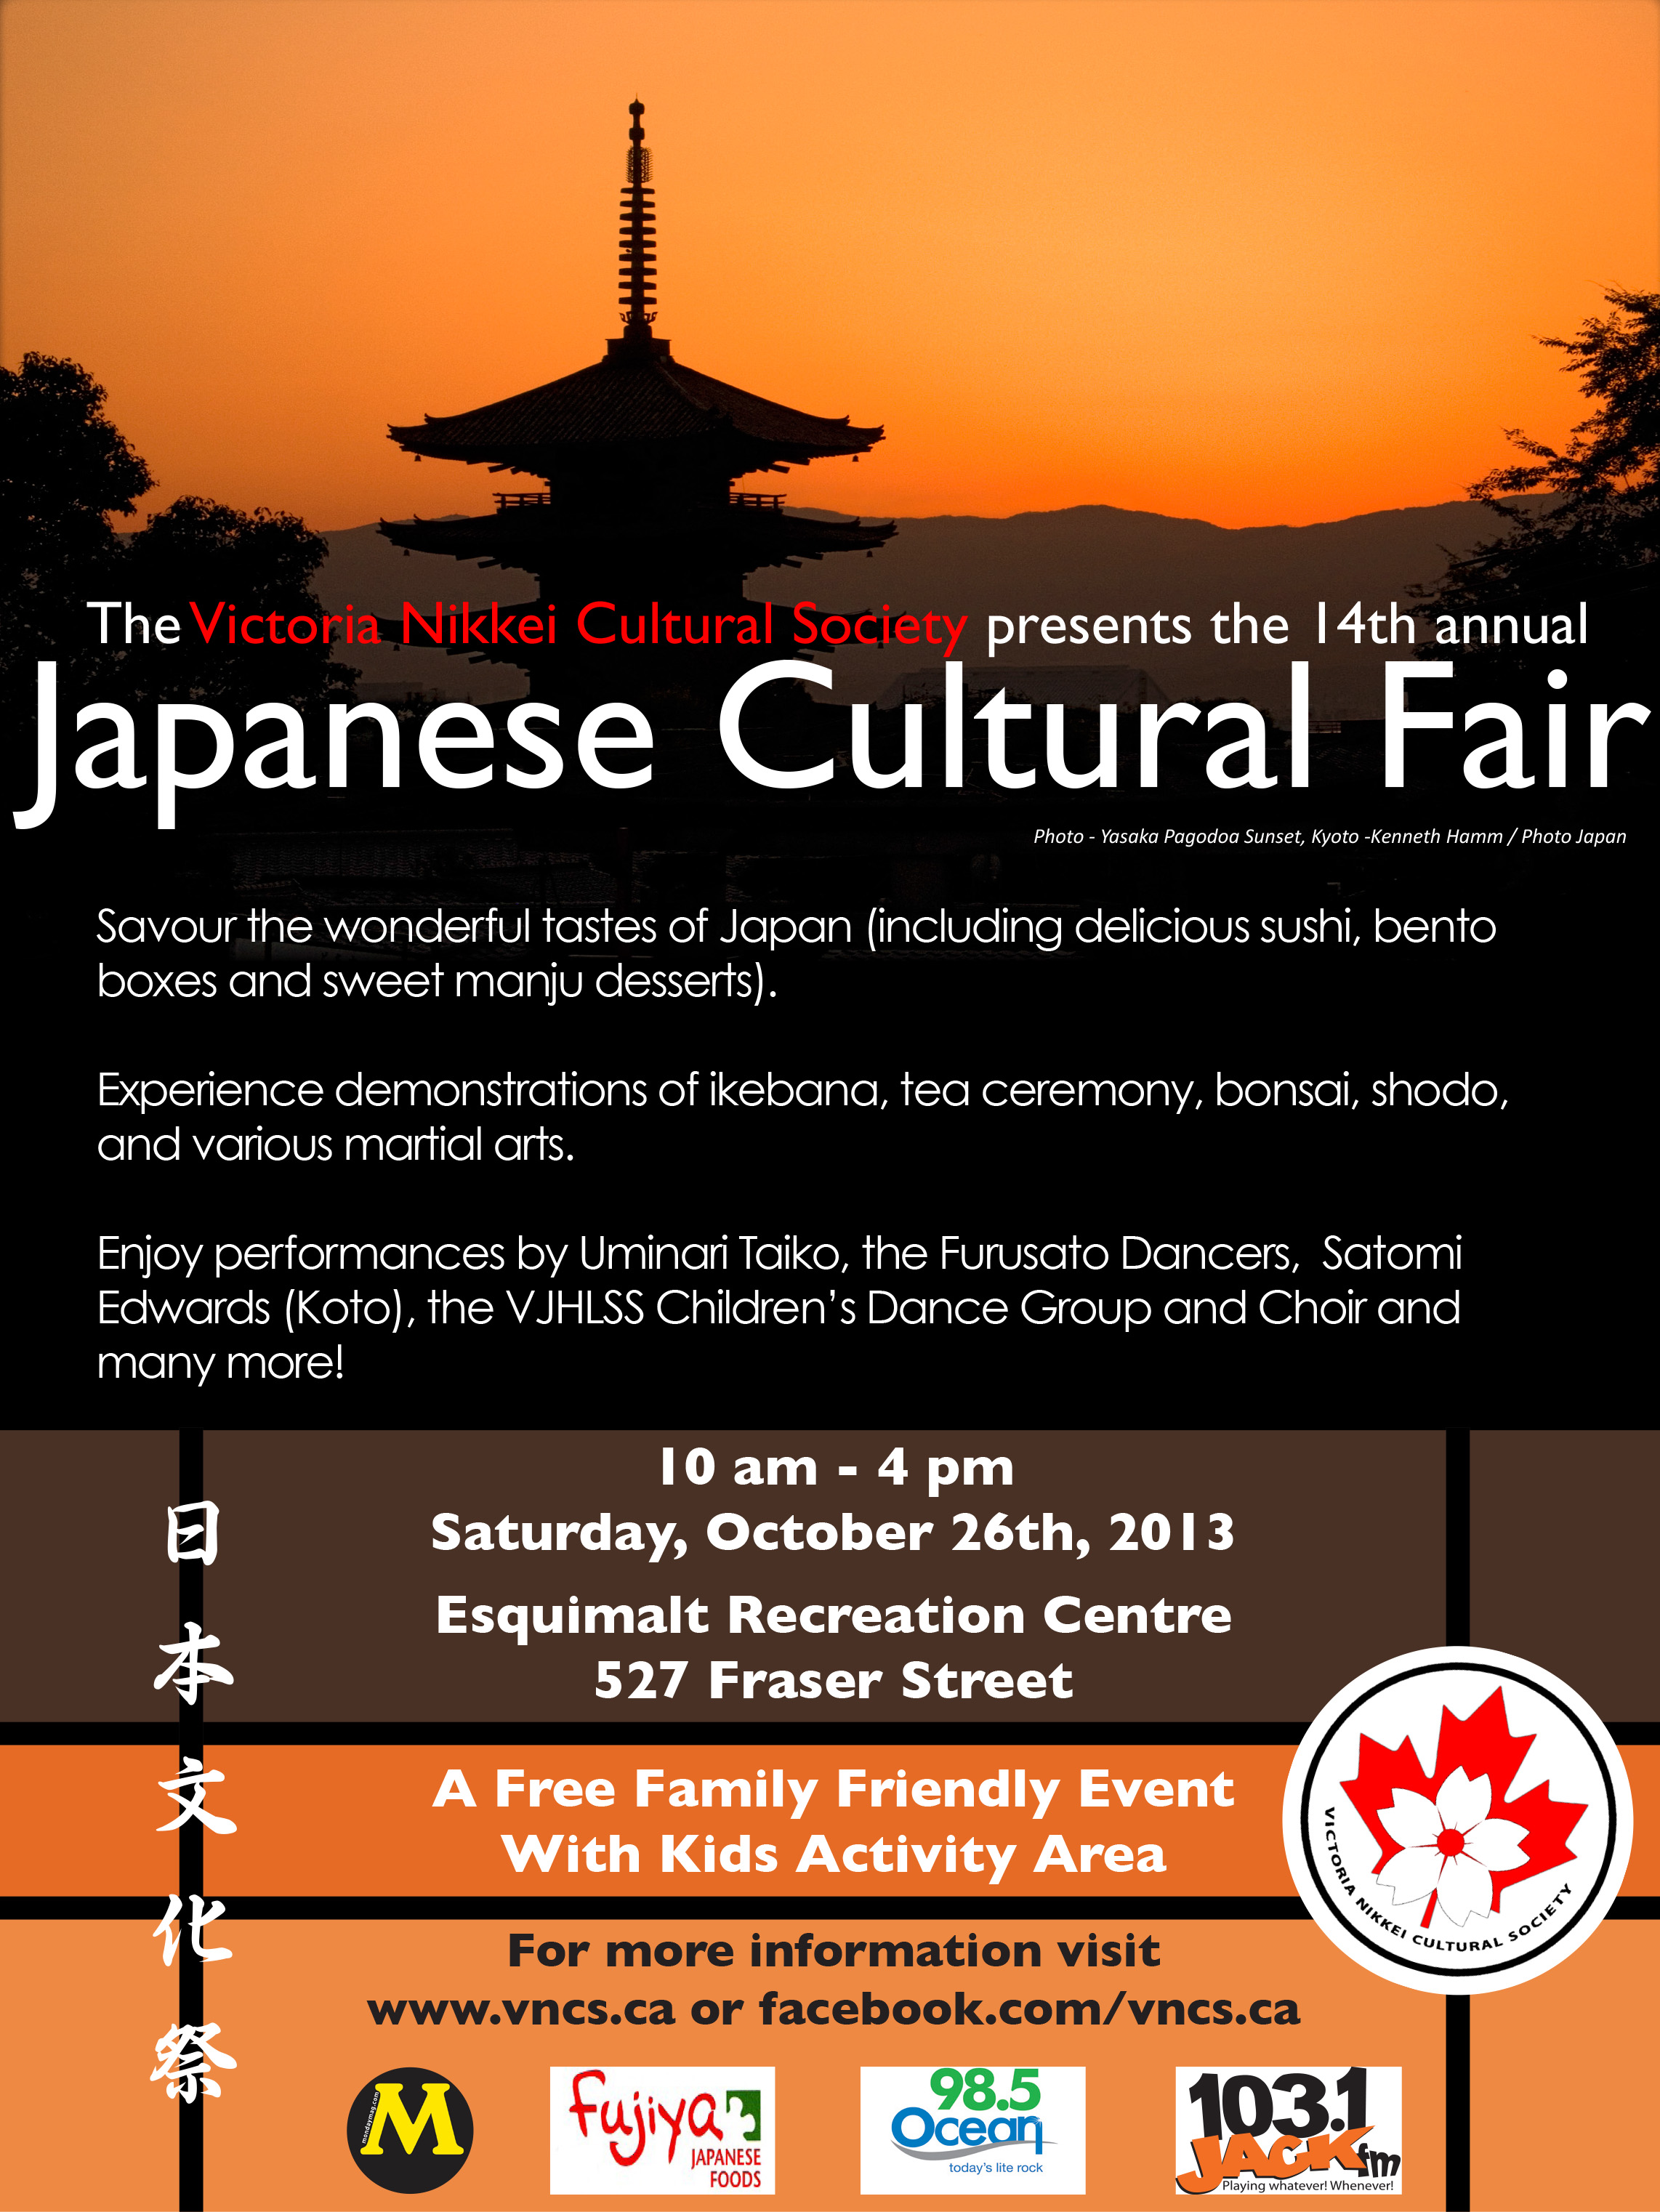 2013 VNCS Japanese Cultural Fair Poster